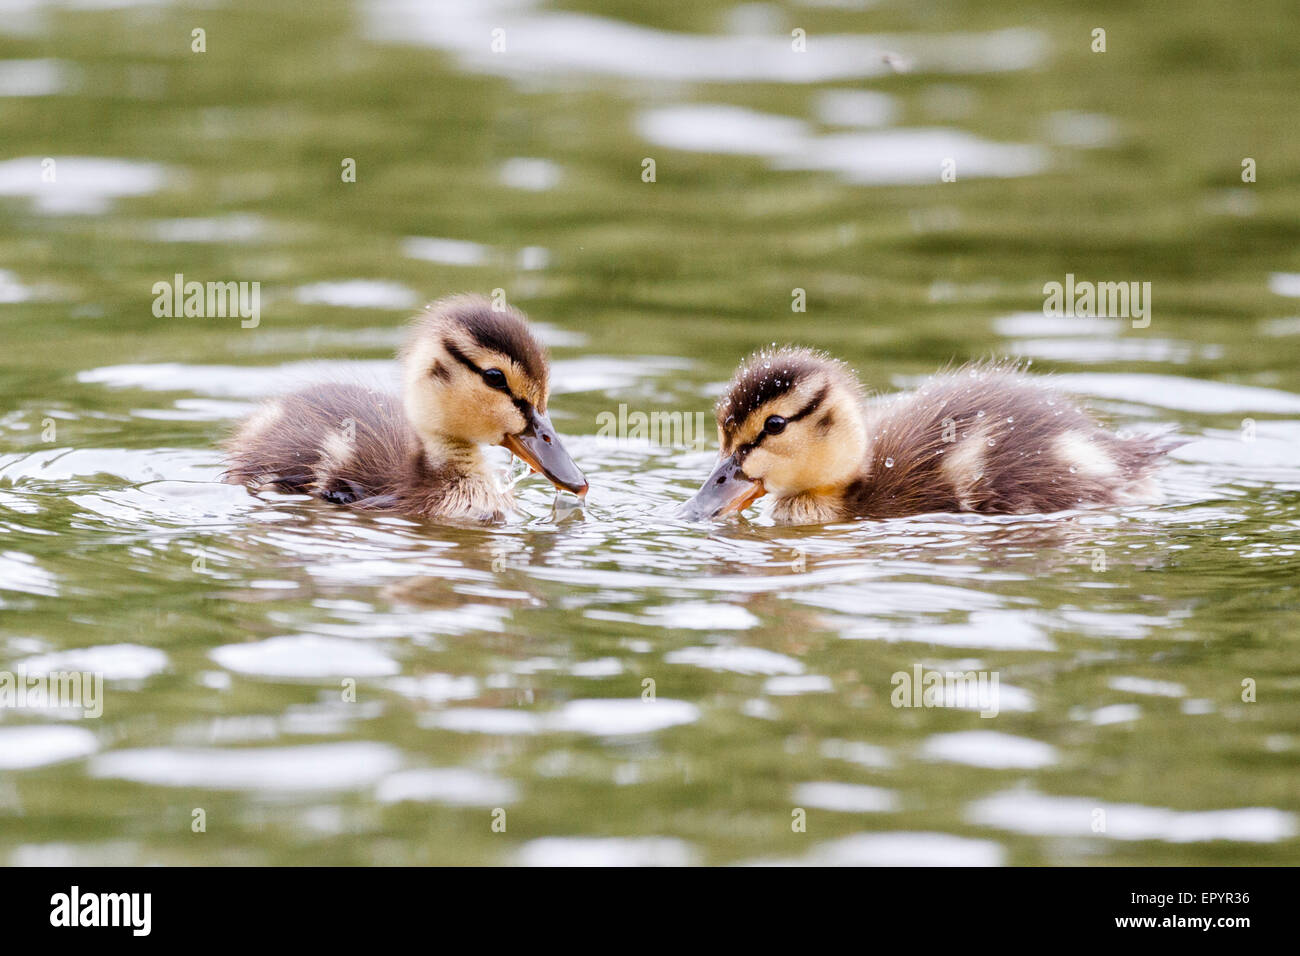 Windsor, UK. 23. Mai 2015. 23. Mai 2015. Windsor, UK. UK-Wetter. Ein paar Stockente Entchen schwimmen auf einem Stockbild